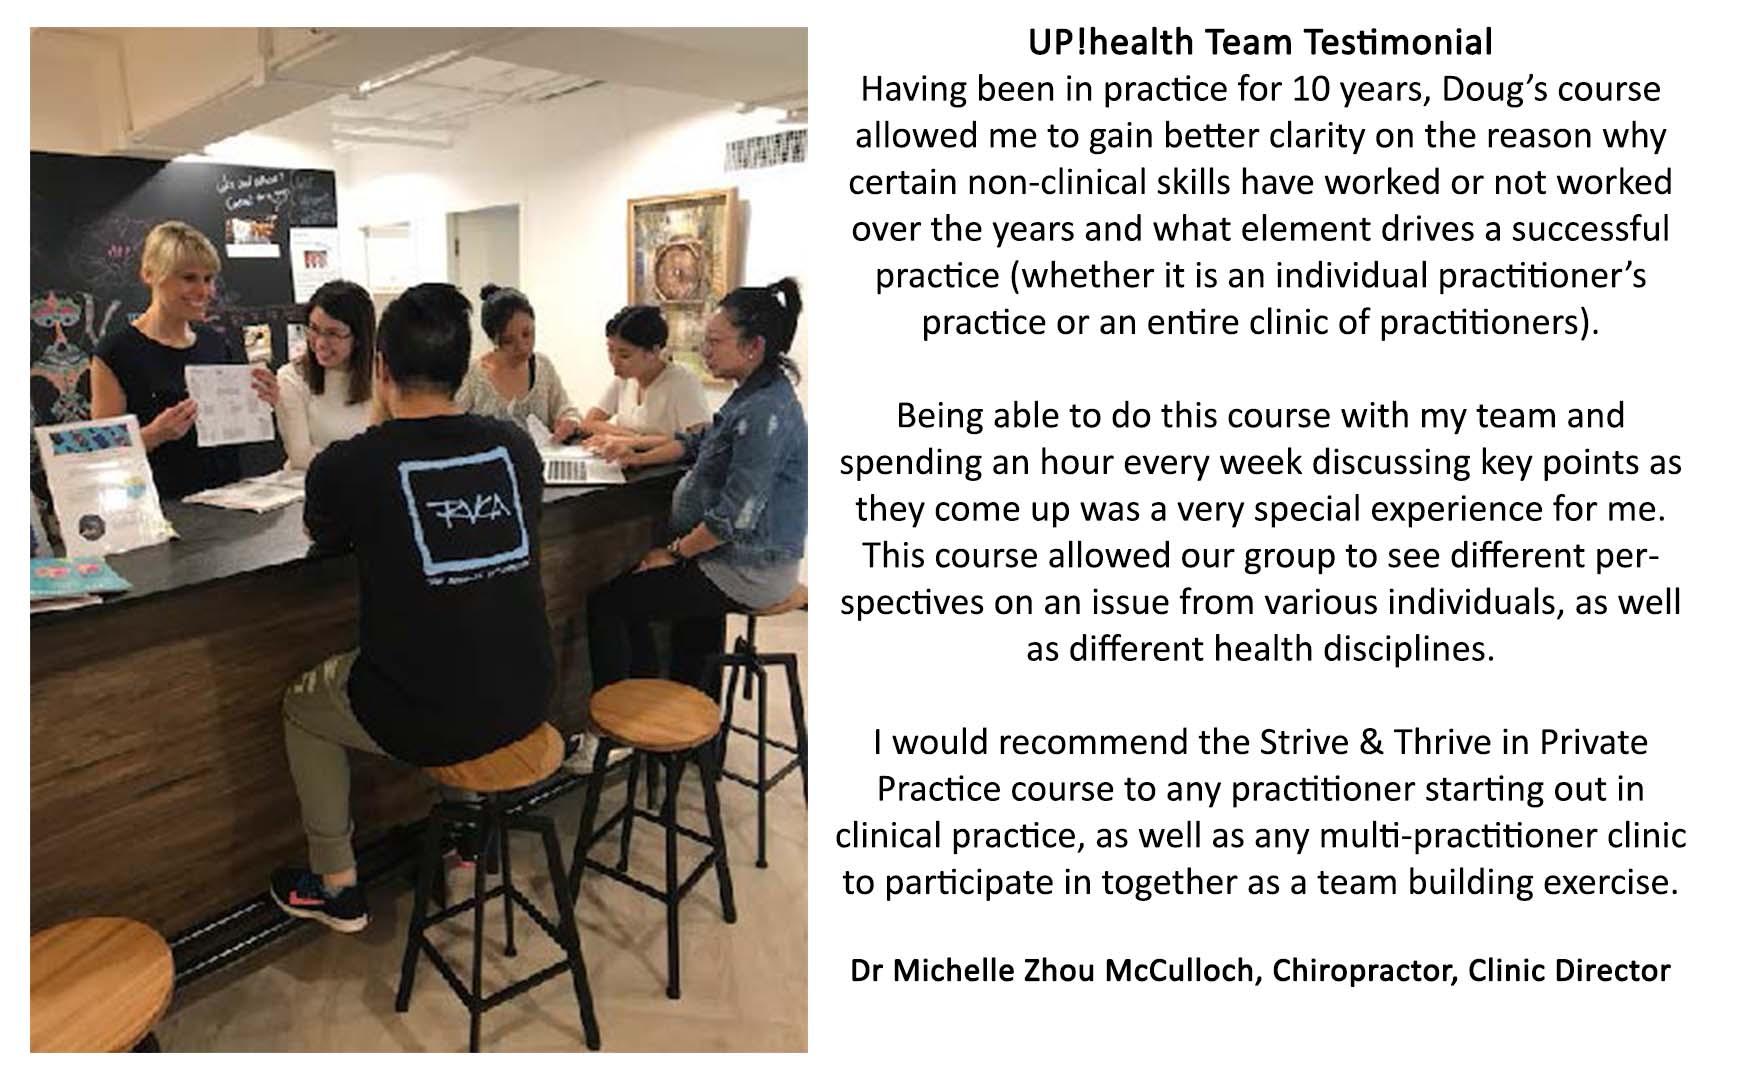 Uphealth testamonial